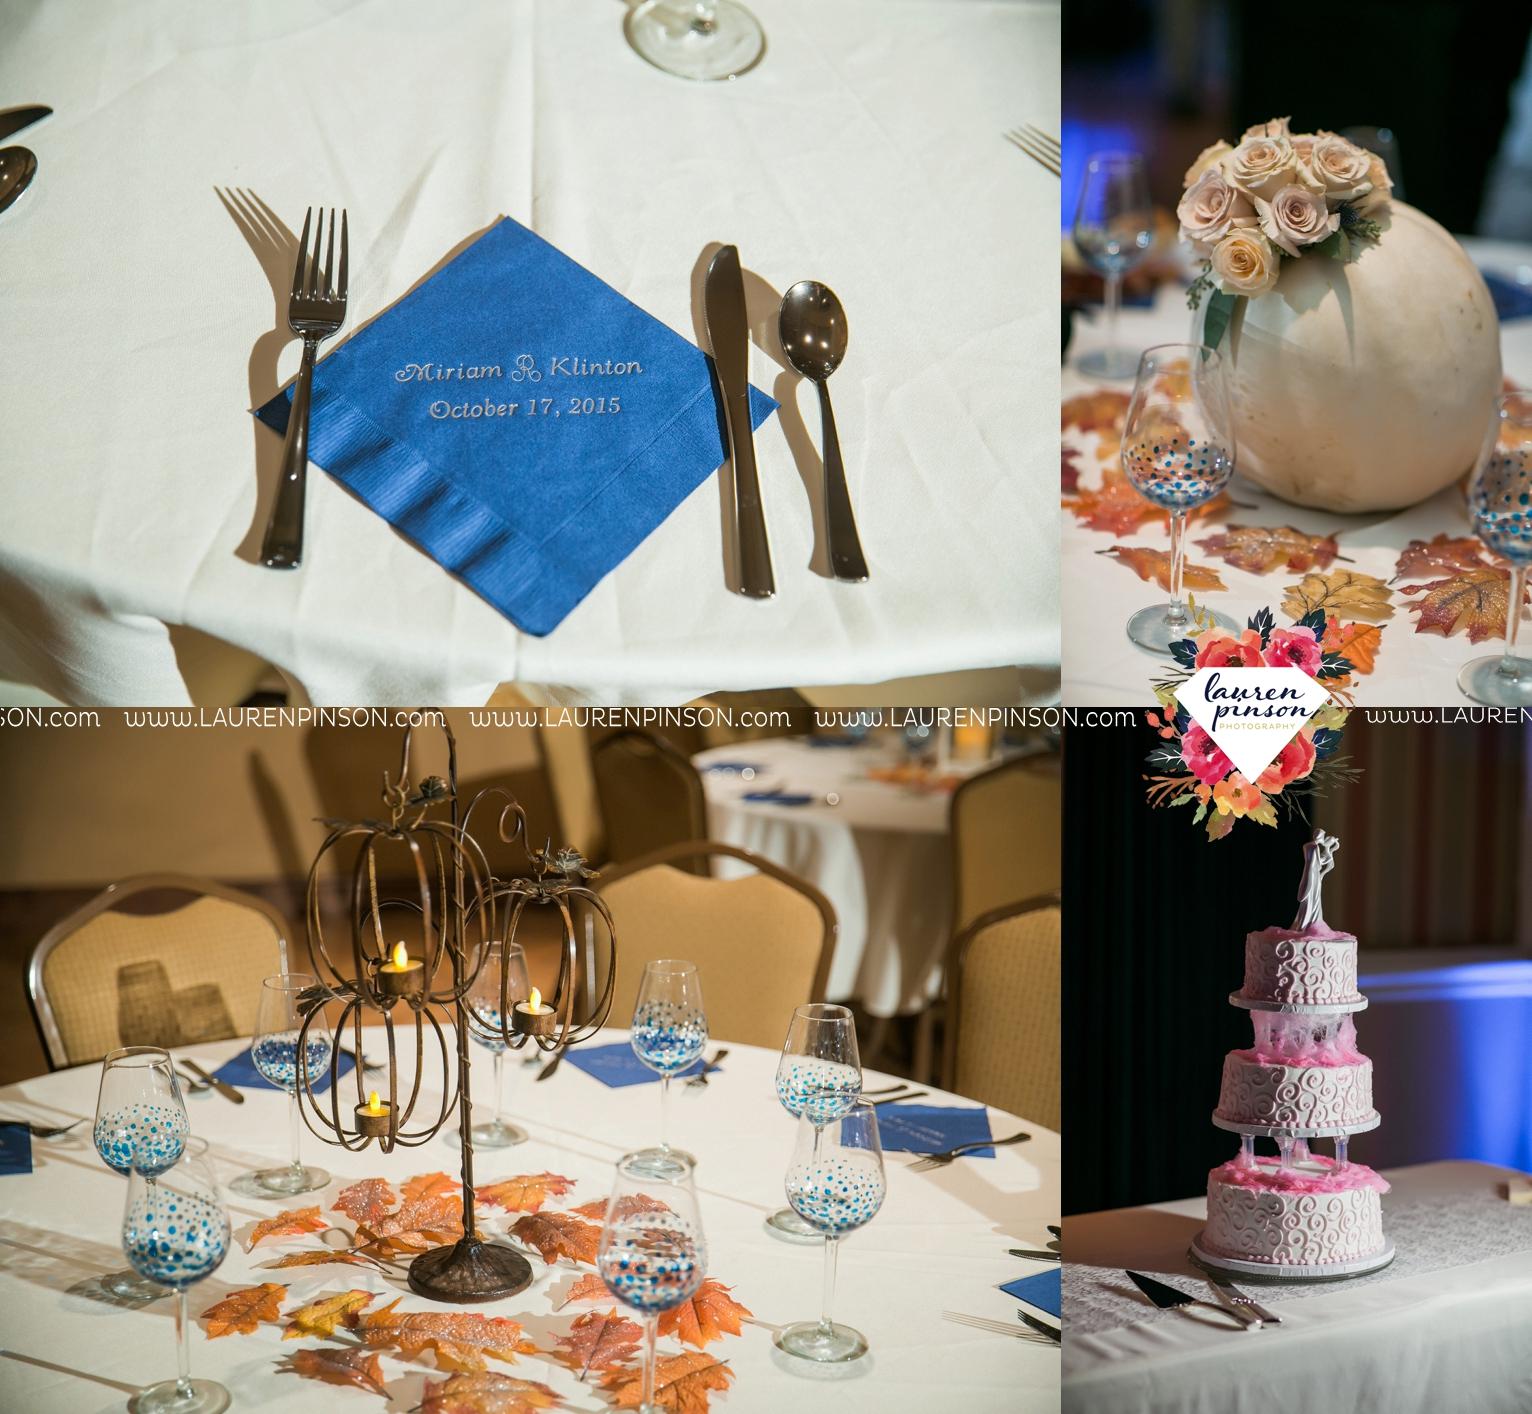 kemp-center-for-the-arts-wichita-falls-texas-wedding-photographer-fall-wedding-pumpkins-184.jpg